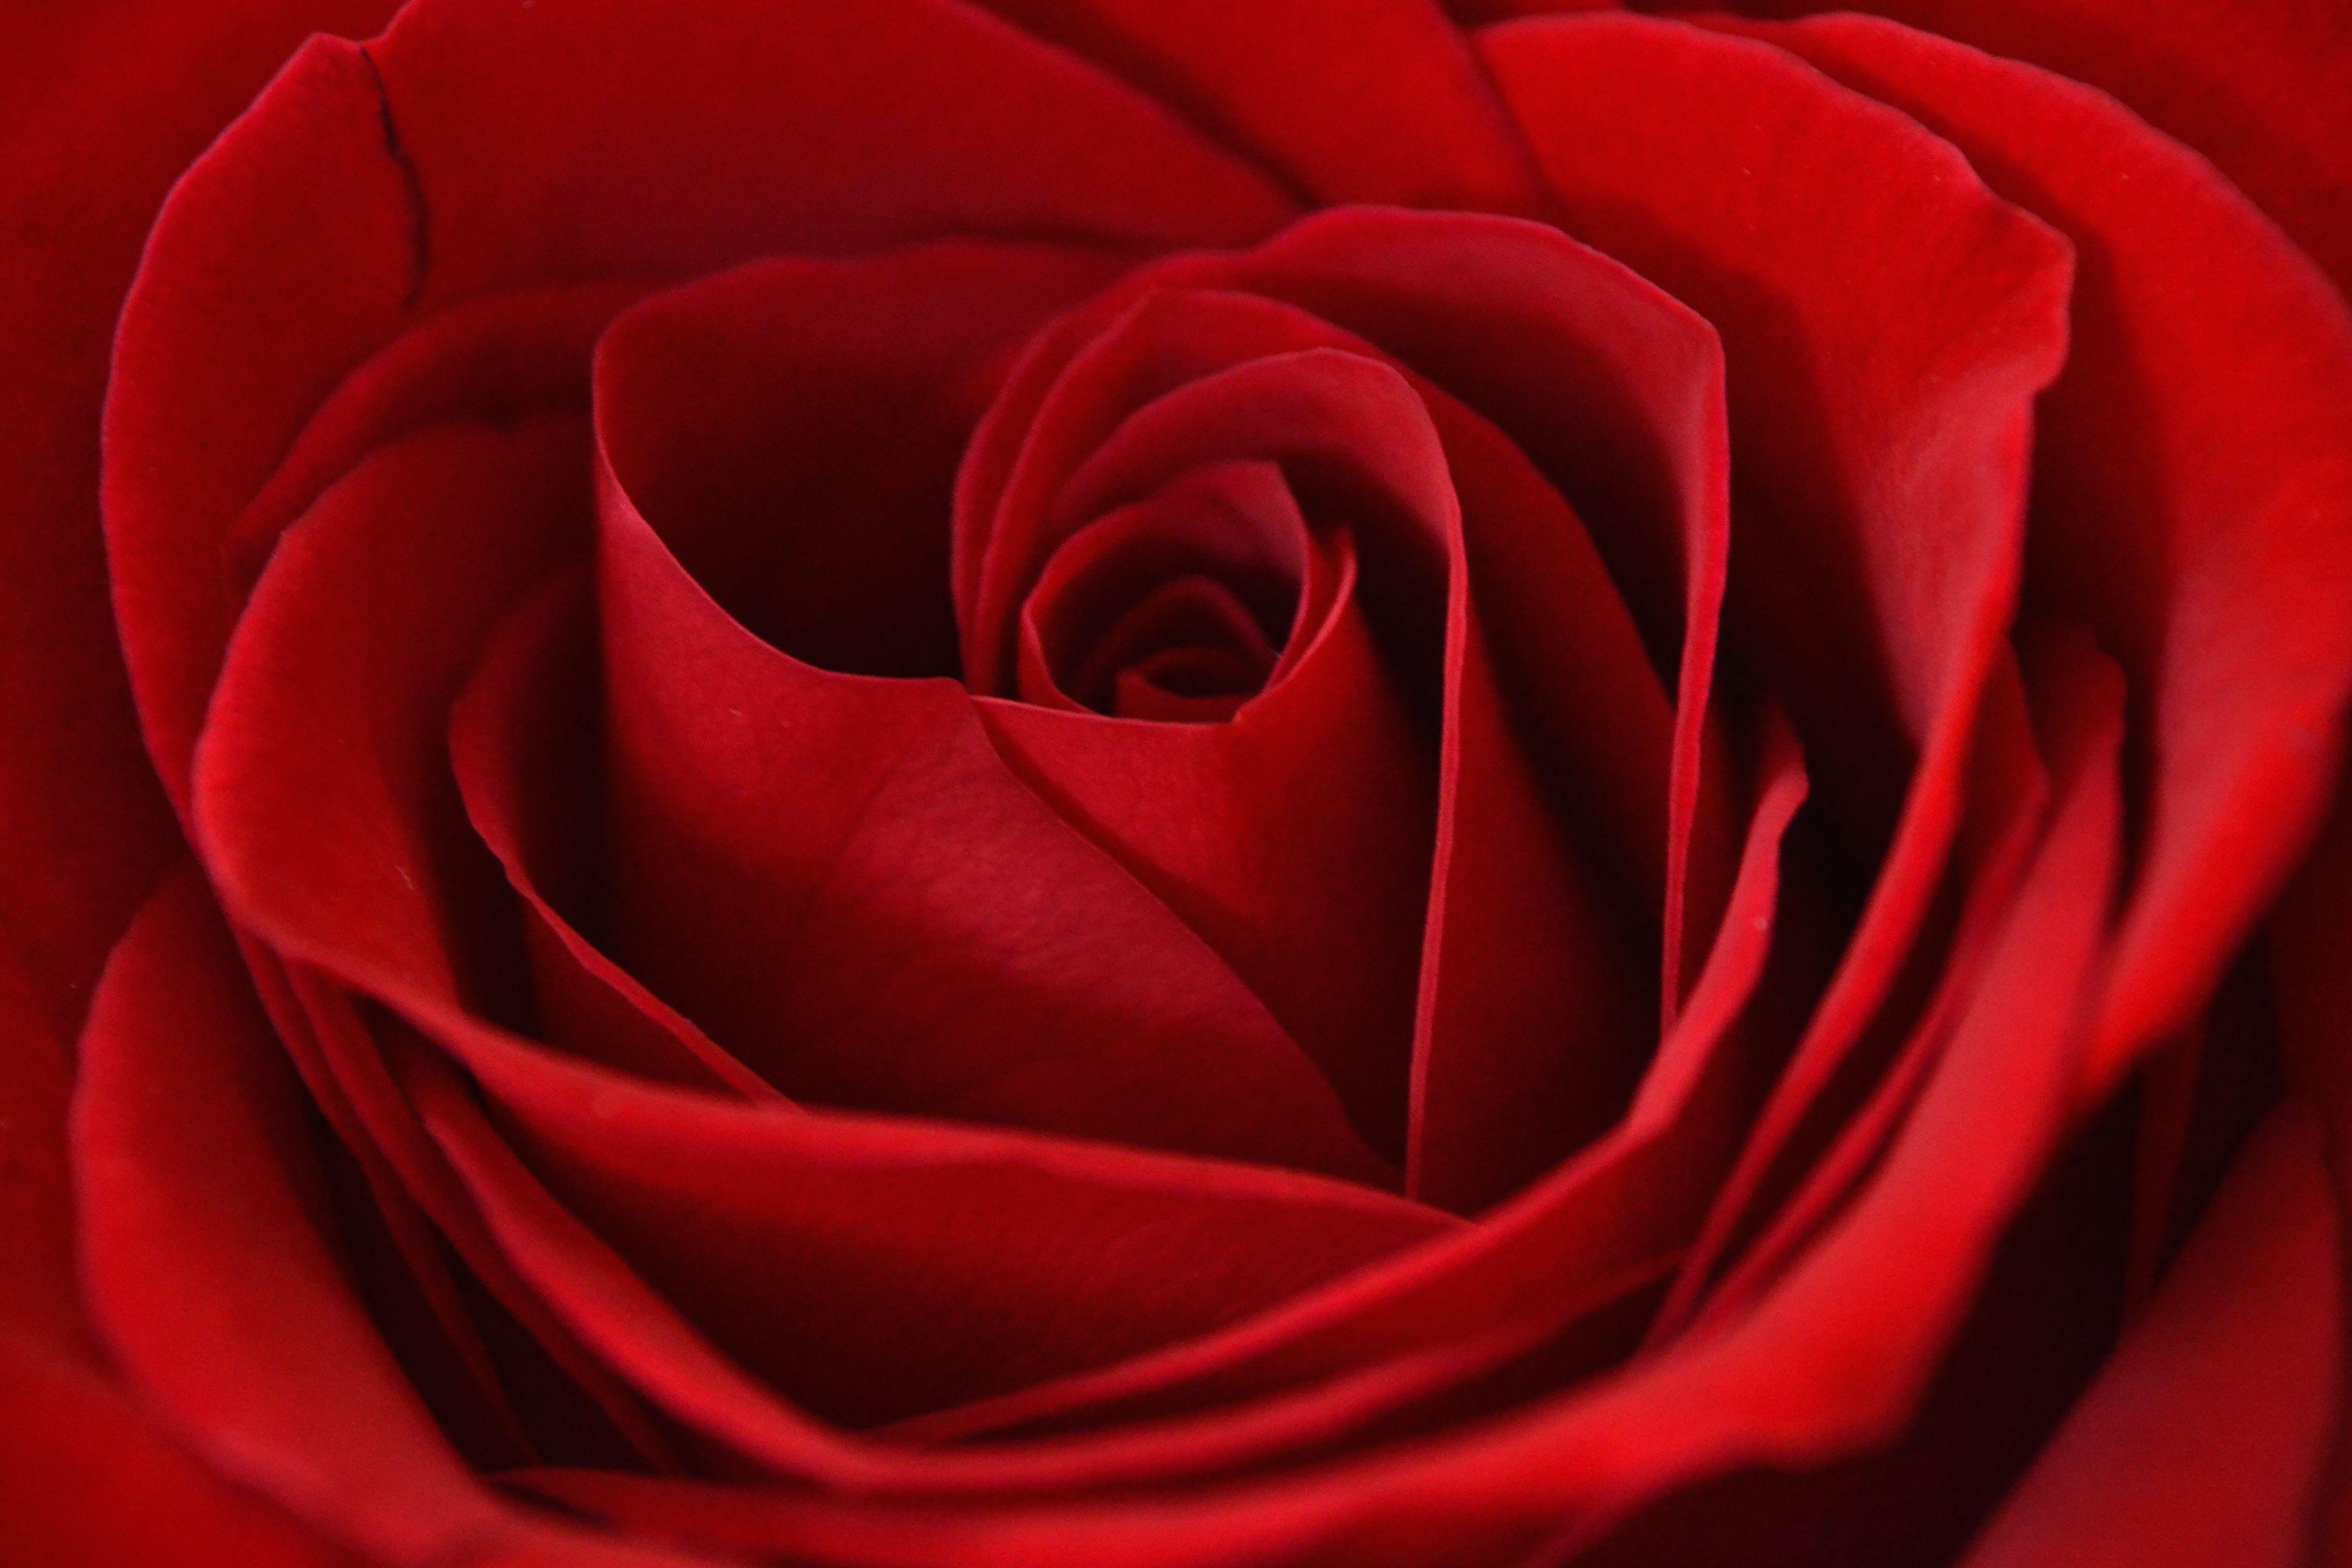 Rose. January 31, 2015.